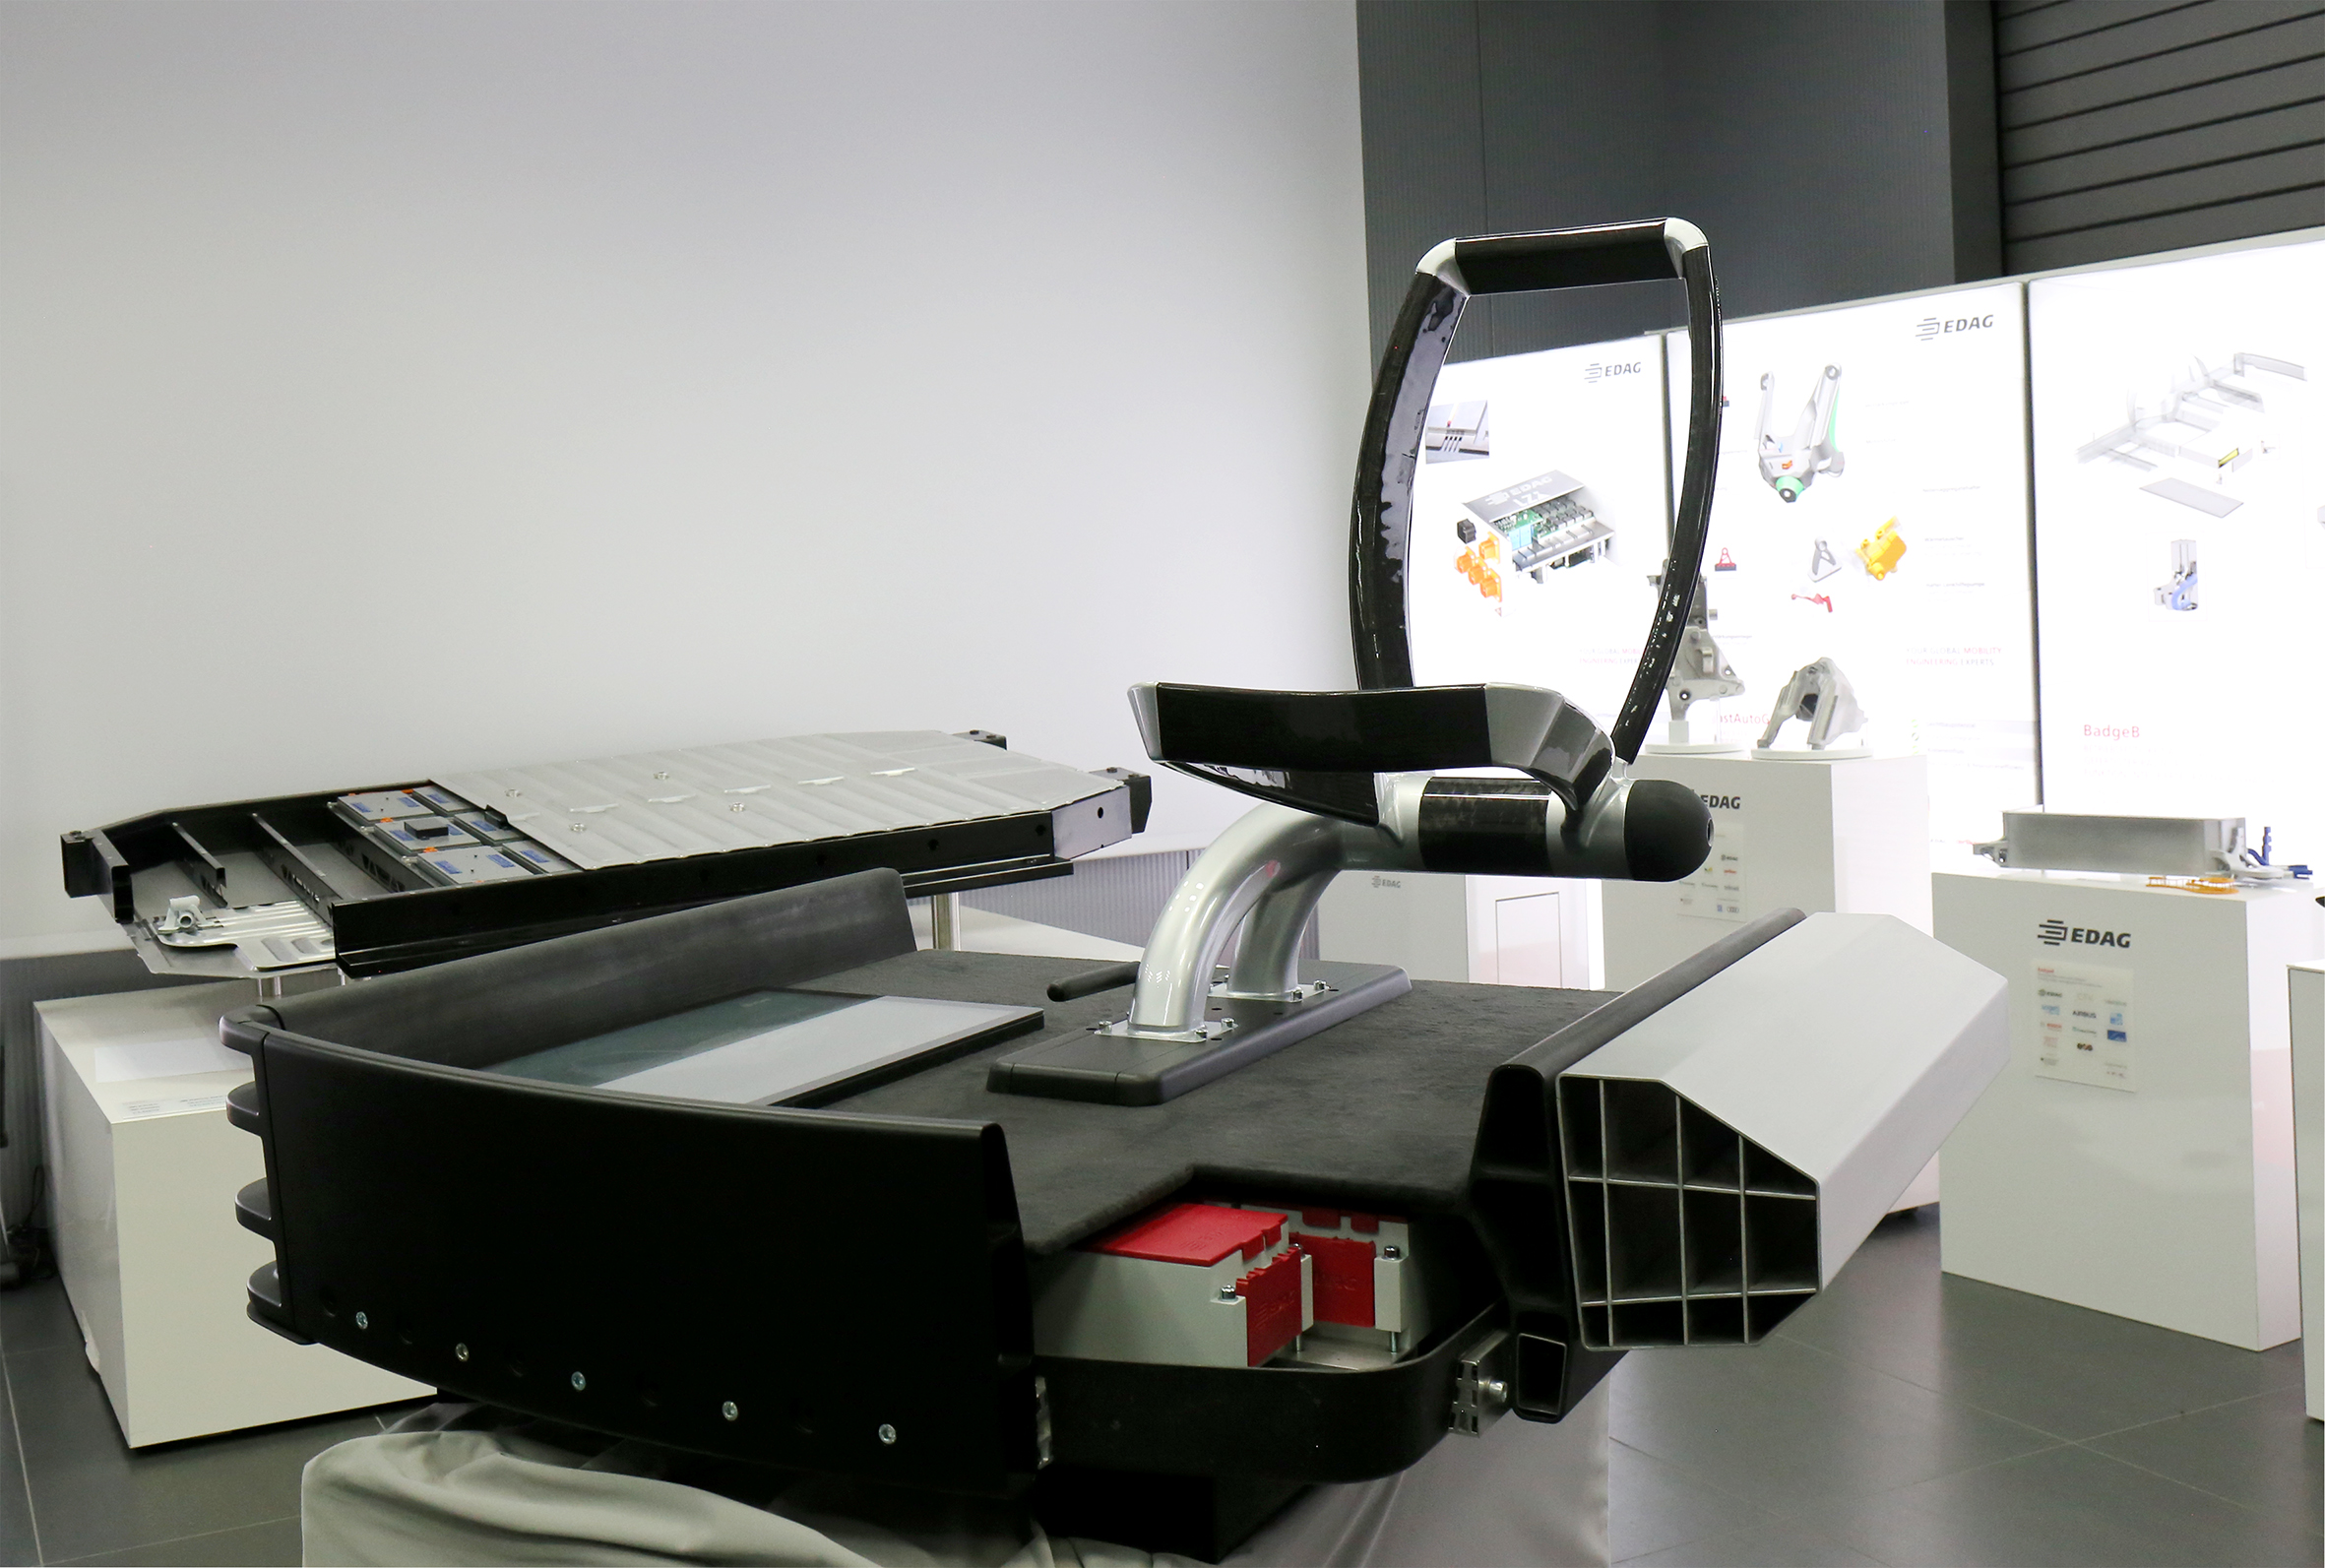 FiberEUse: Die wiederverwendbare Fahrzeugplattform (Bild: EDAG Engineering GmbH)